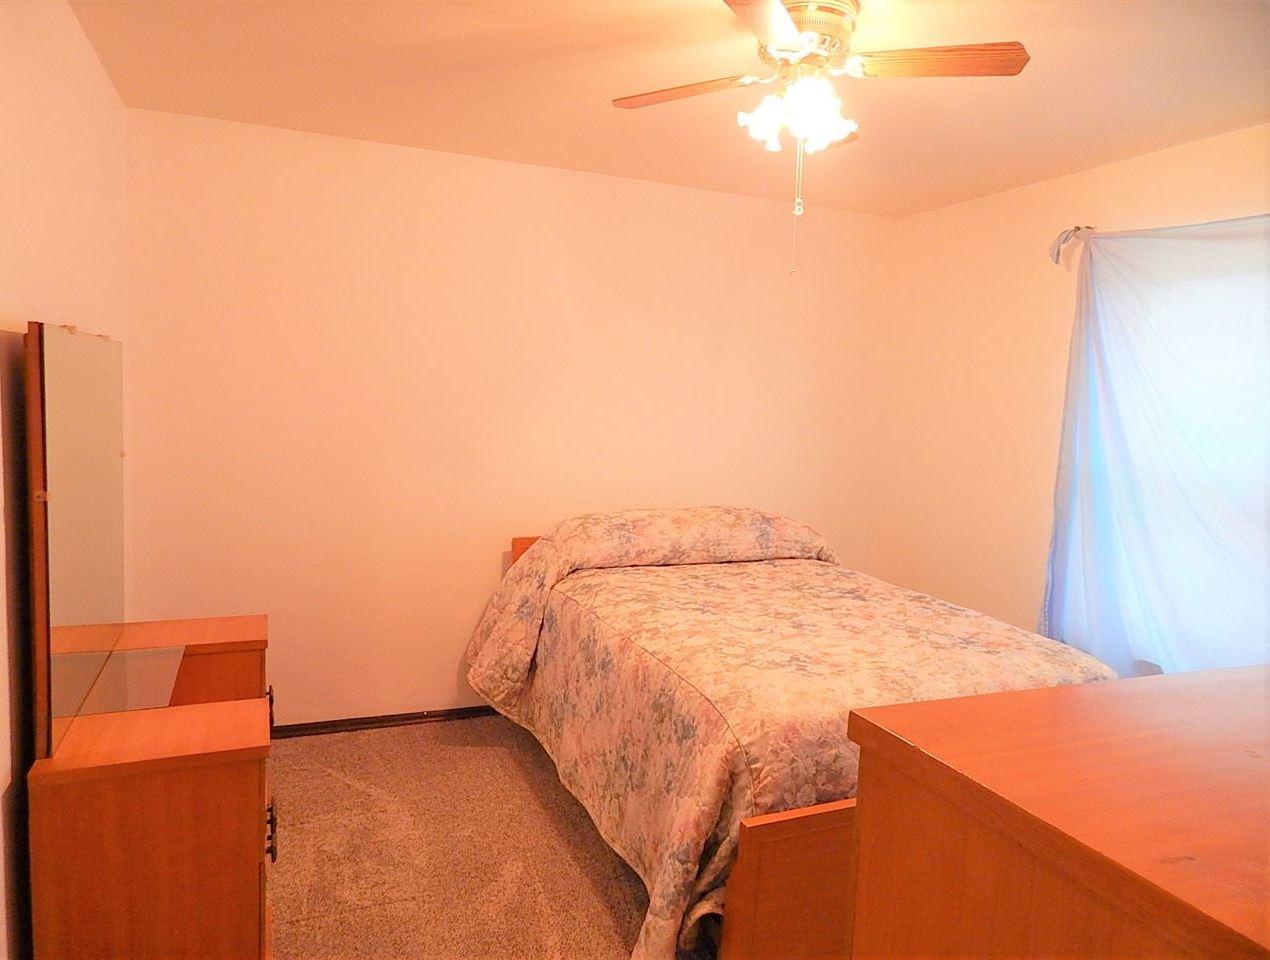 Sold Cross Sale W/ MLS | 2113 Berkshire Ponca City, OK 74604 12